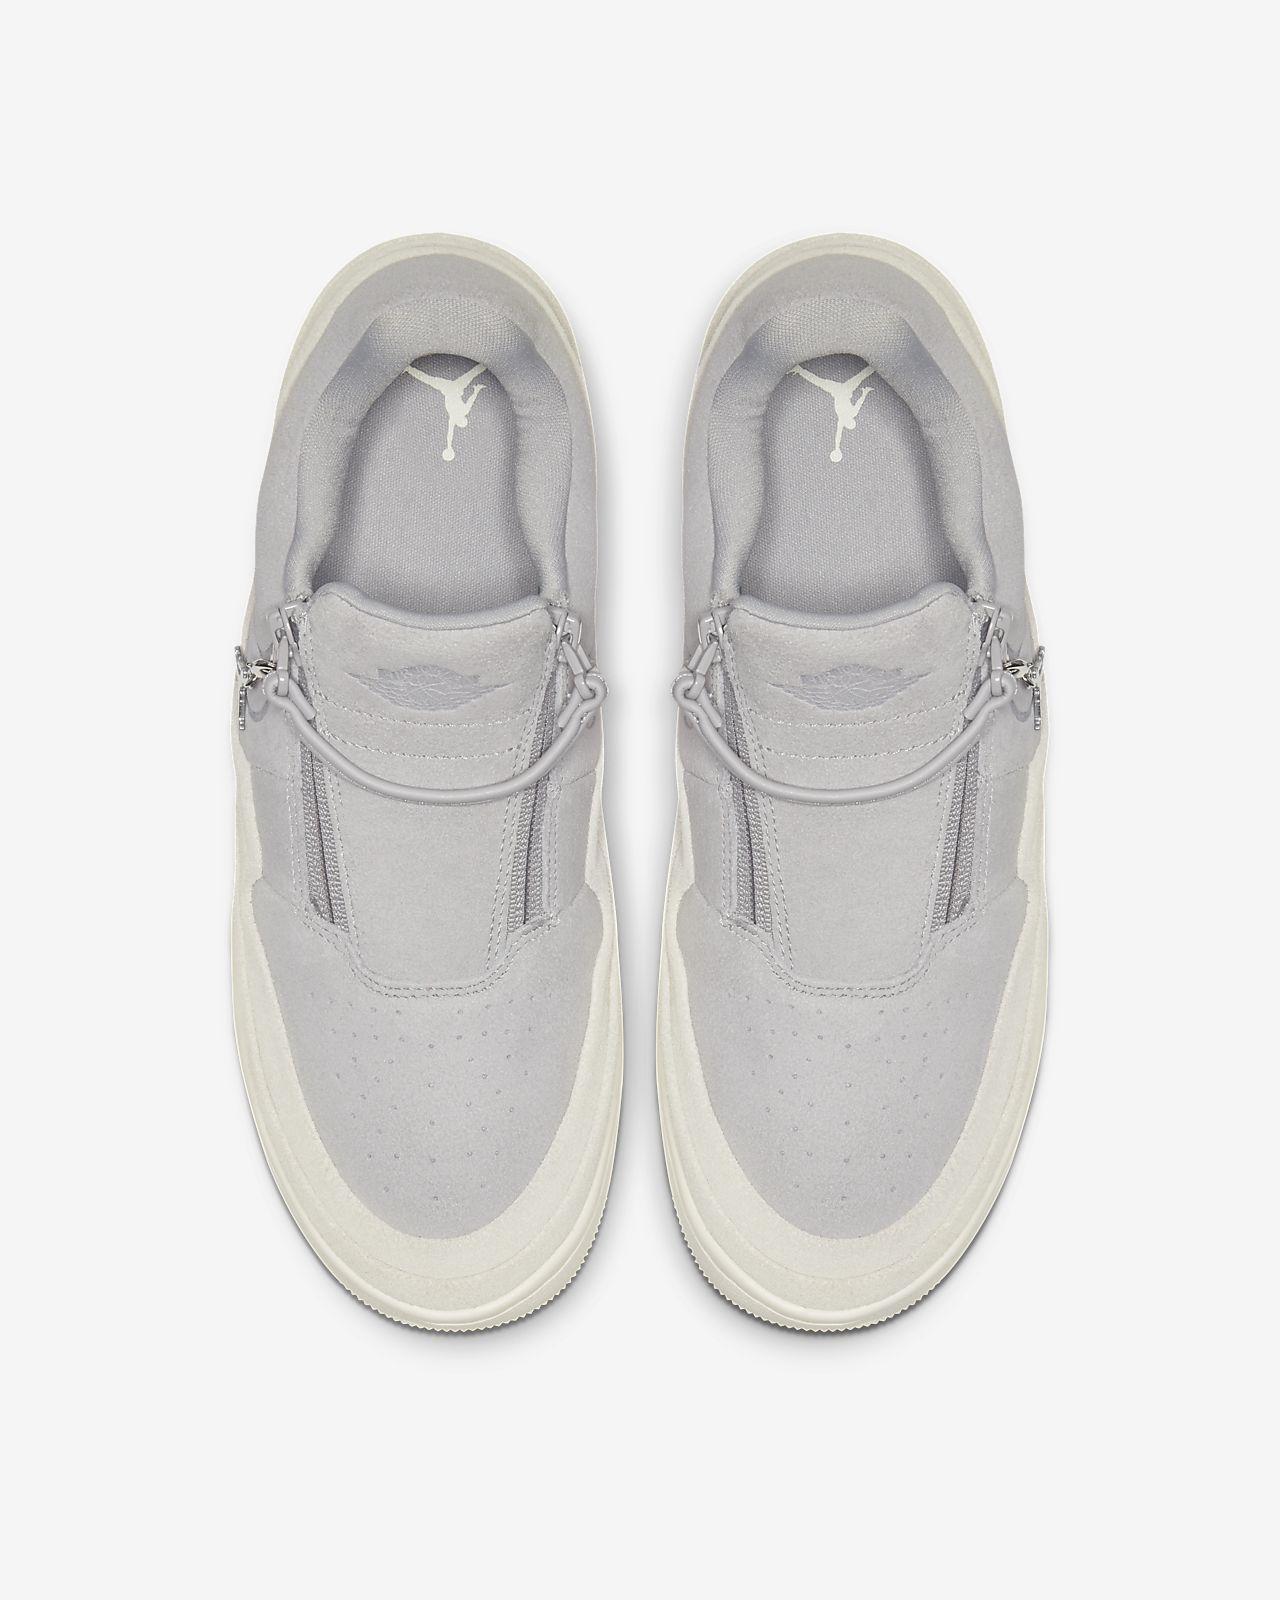 b7a3bde4d5 Air Jordan 1 Jester XX Low Women's Shoe